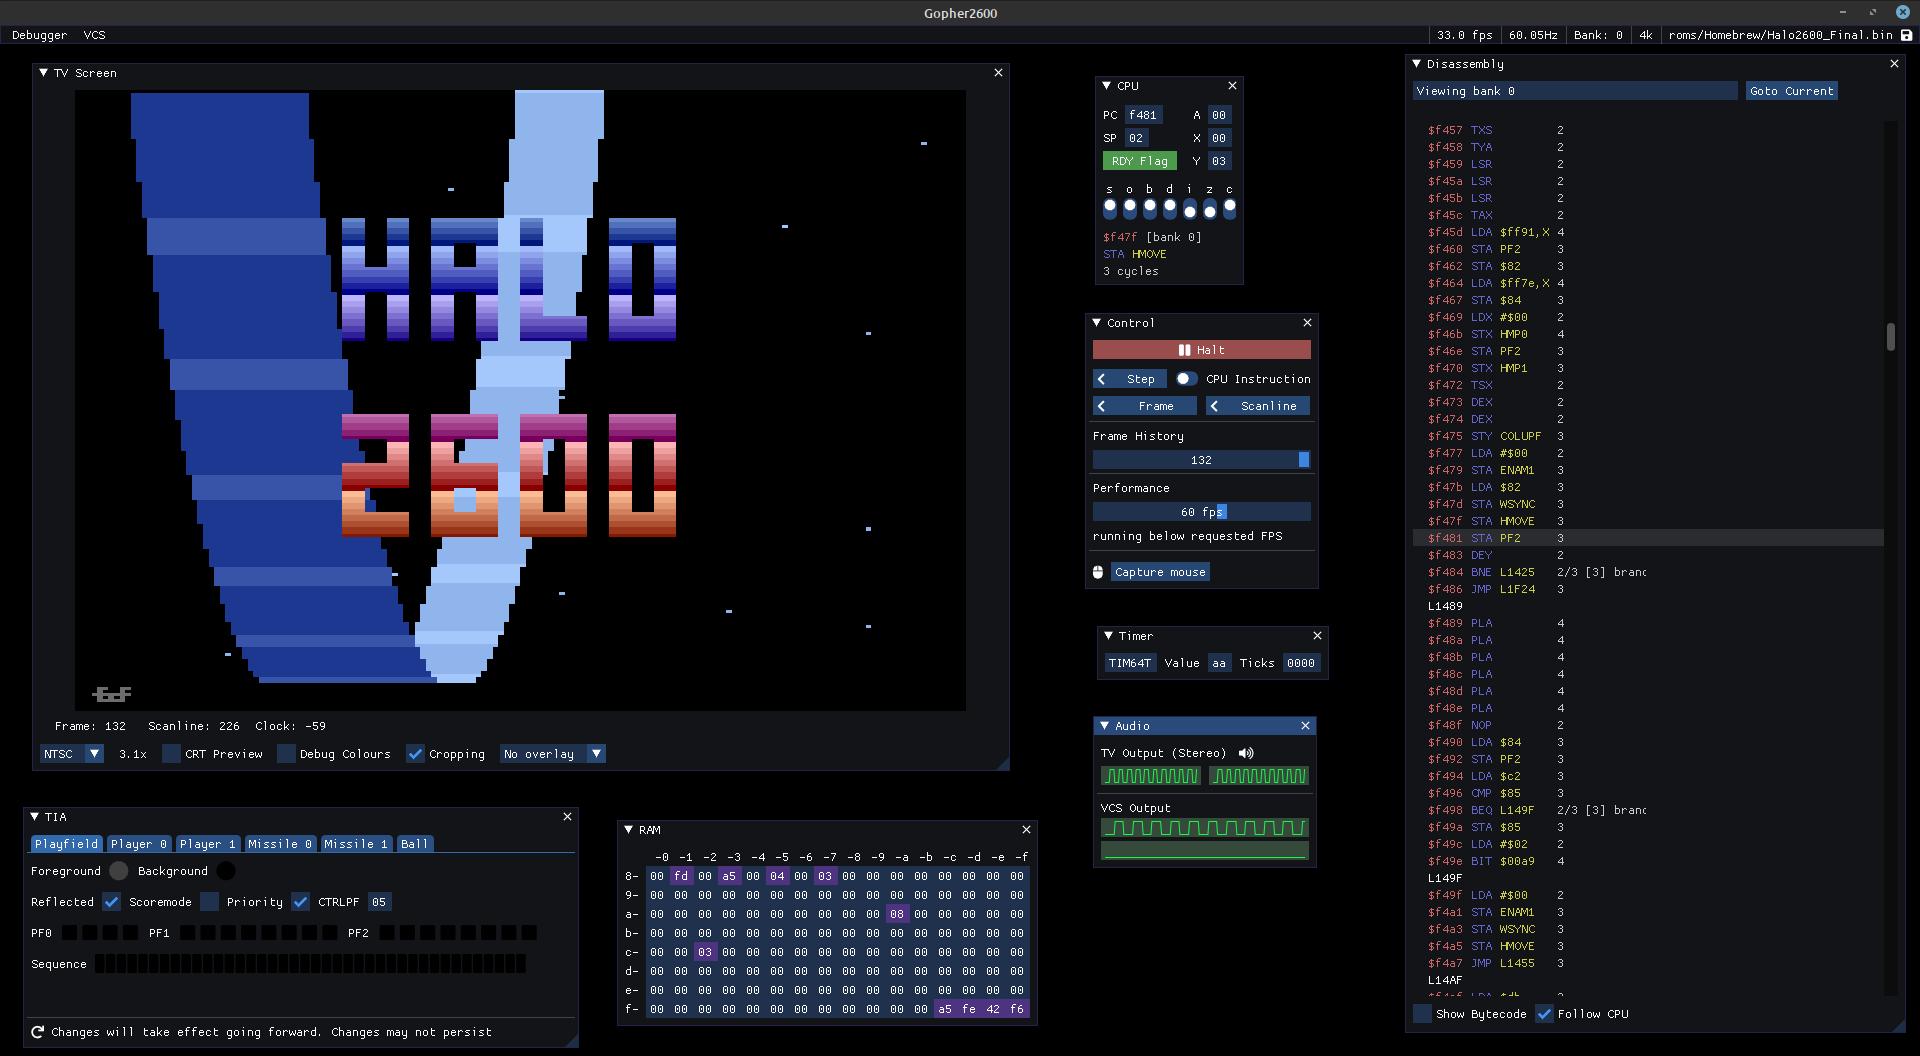 gopher2600 debugging GUI